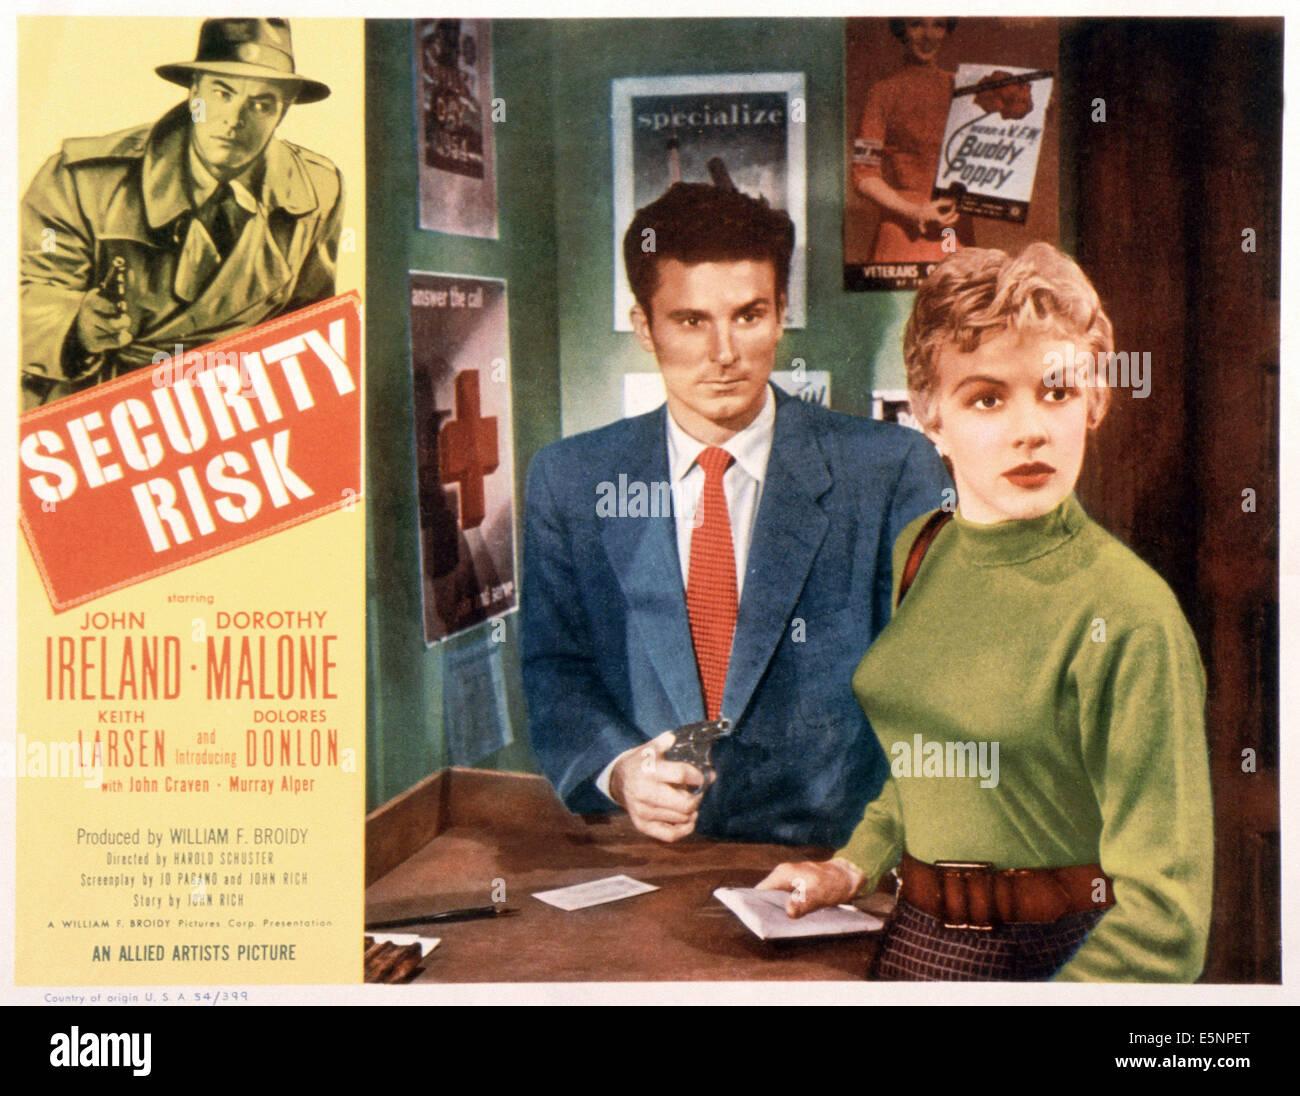 SECURITY RISK, US lobbycard, John Ireland (left), center from left: Keith Larsen, Dolores Donlon, 1954 - Stock Image